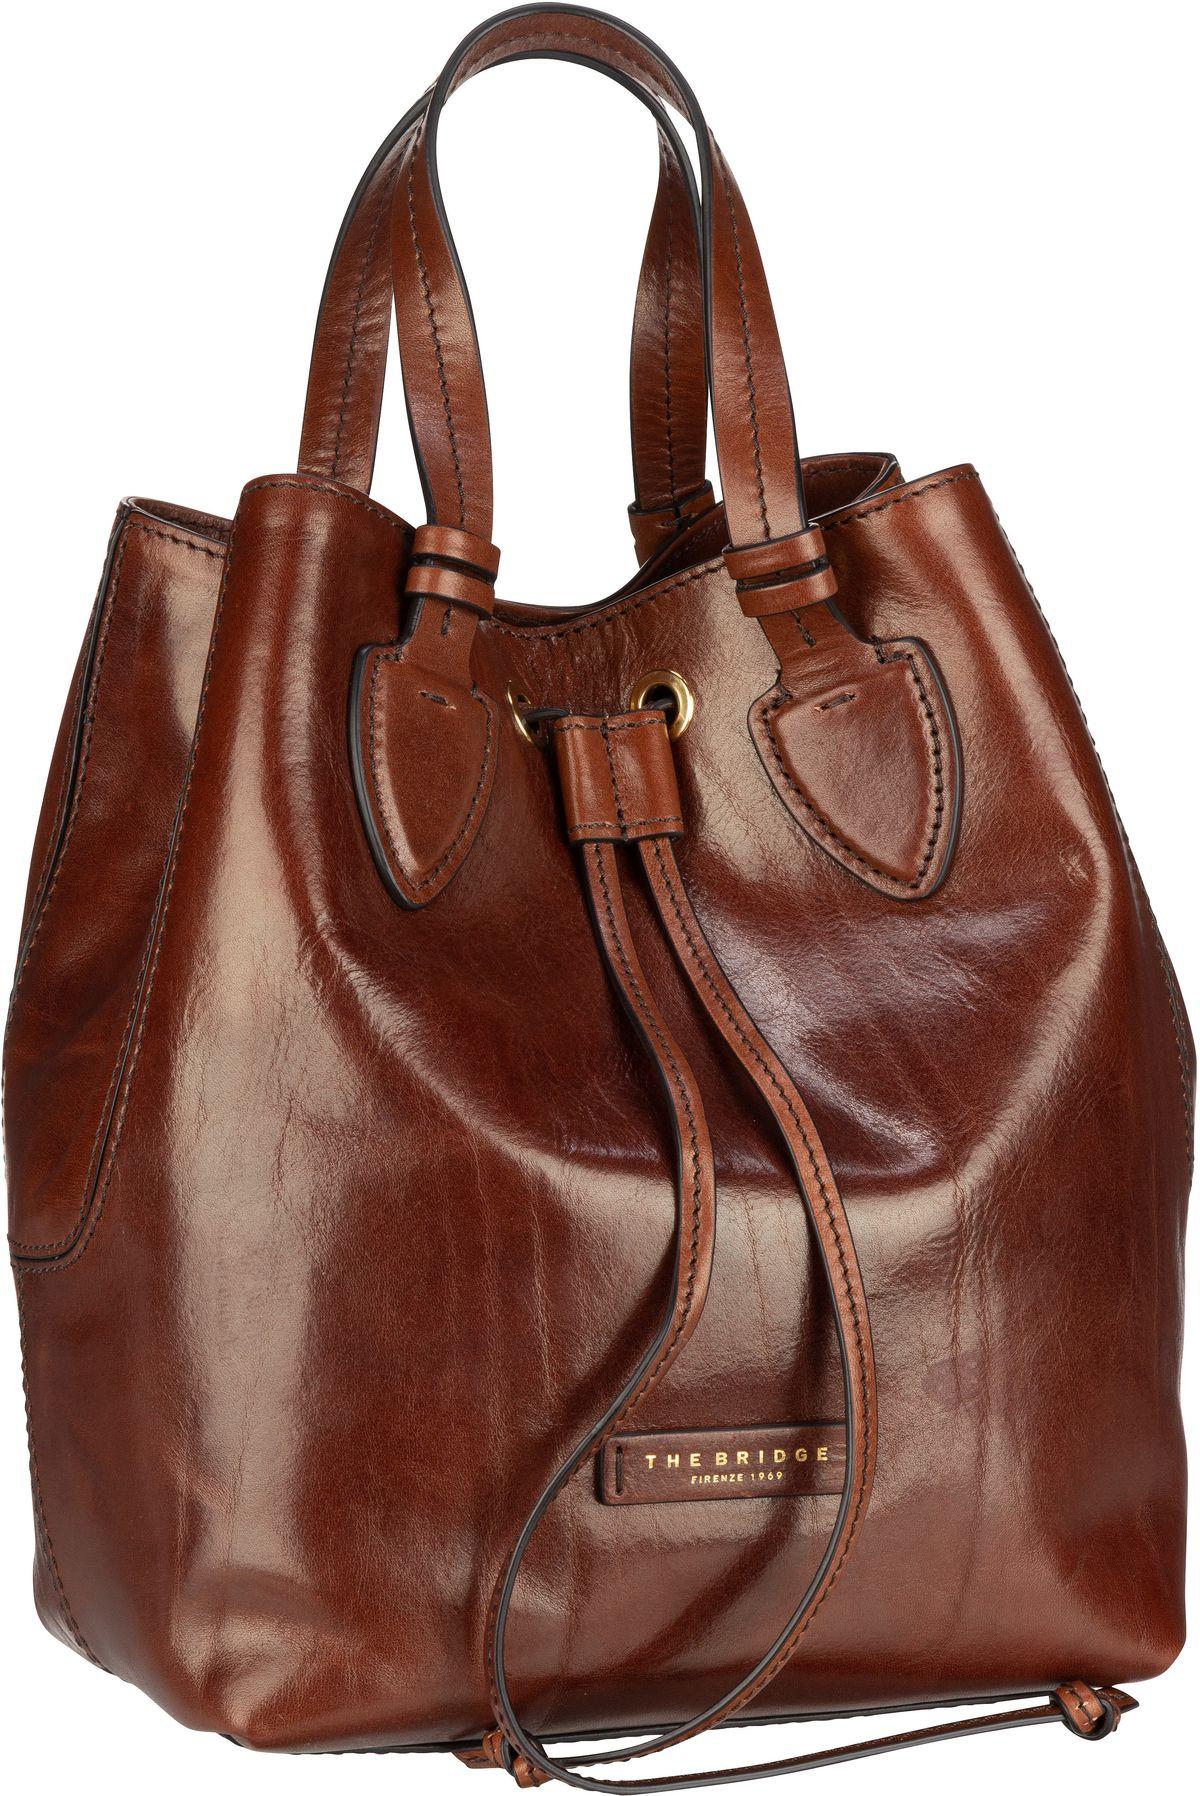 Handtasche Caterina 4710 Marrone/Oro